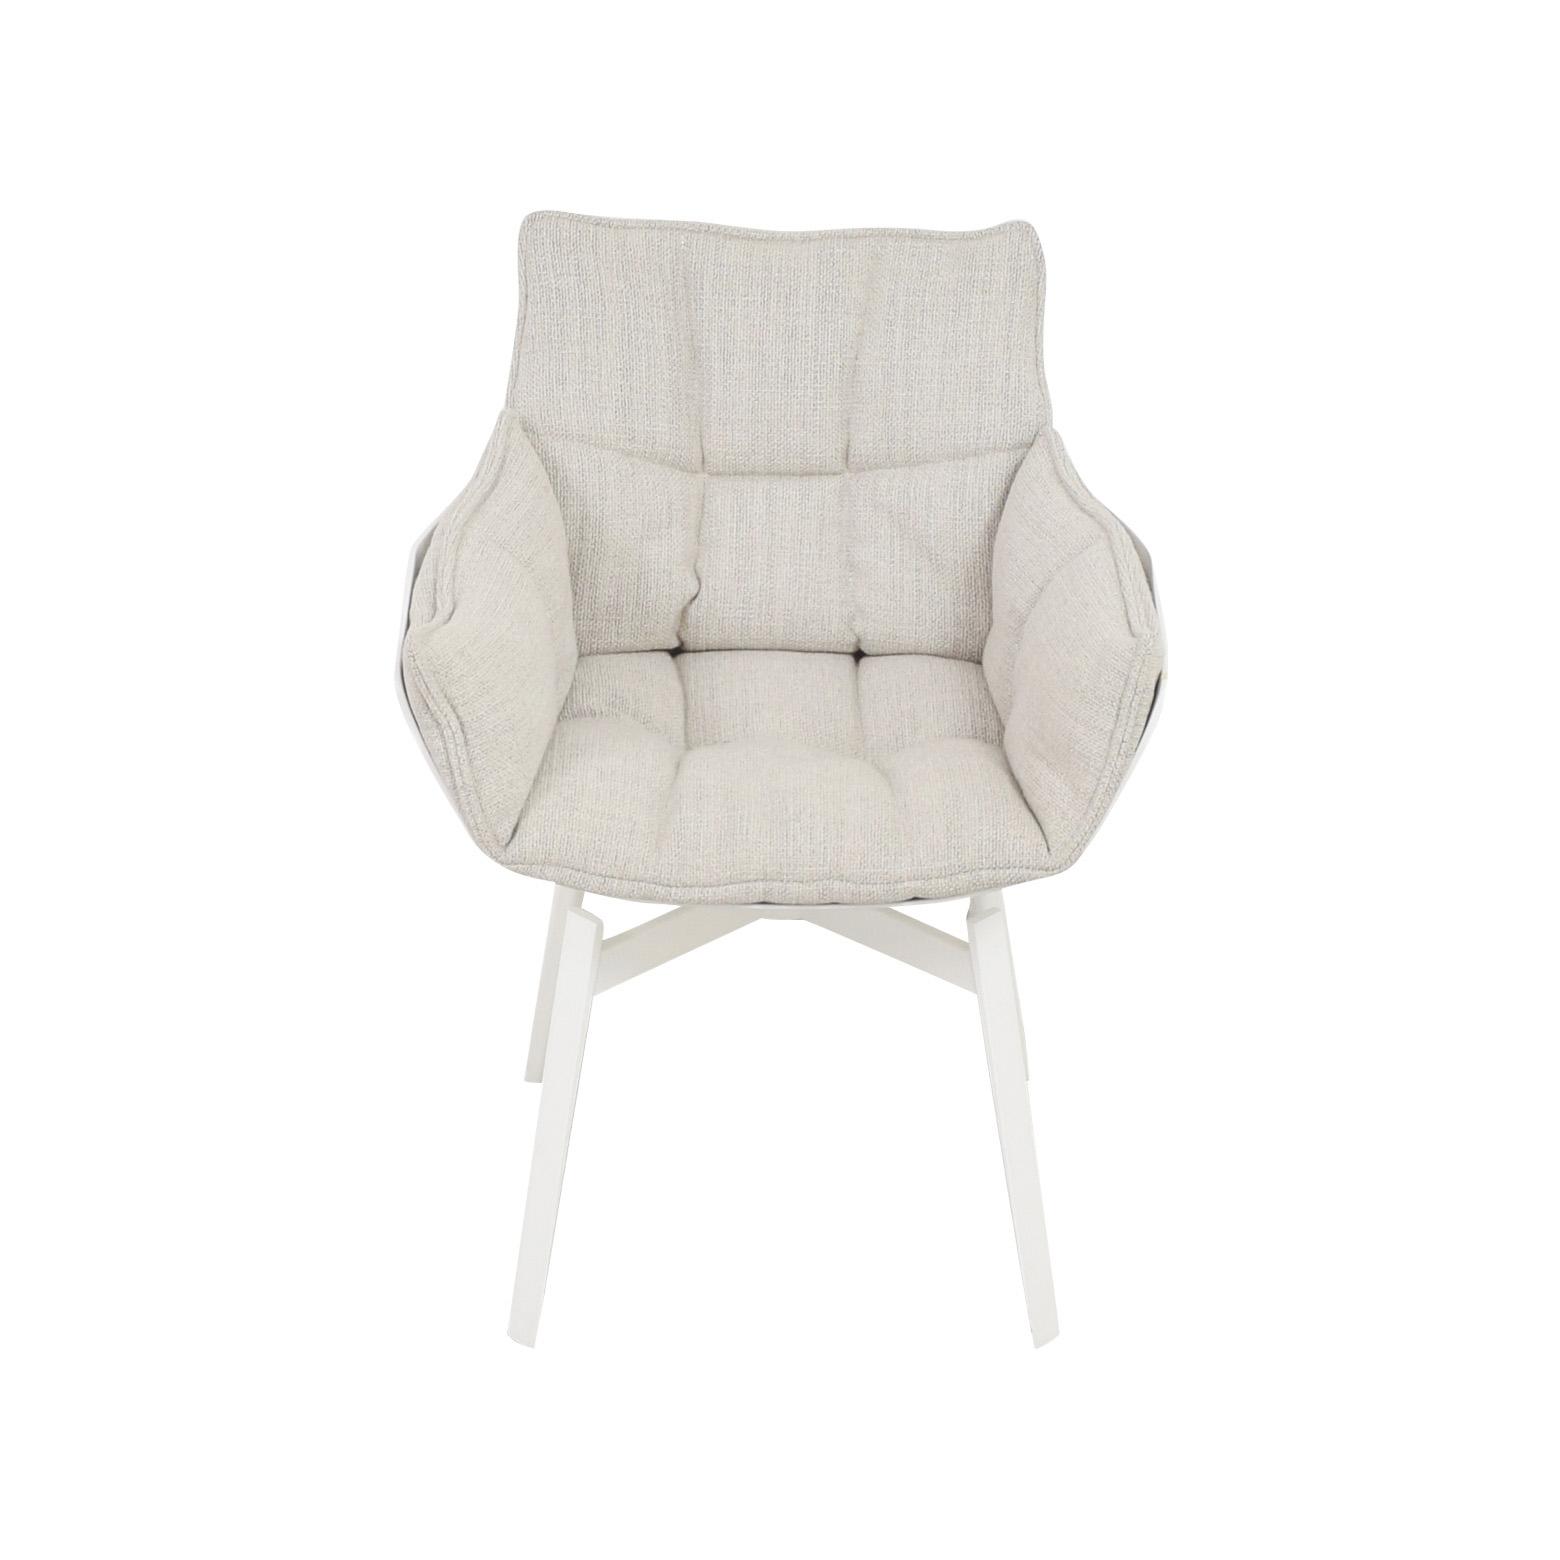 buy B&B Italia Husk Chair B&B Italia Accent Chairs